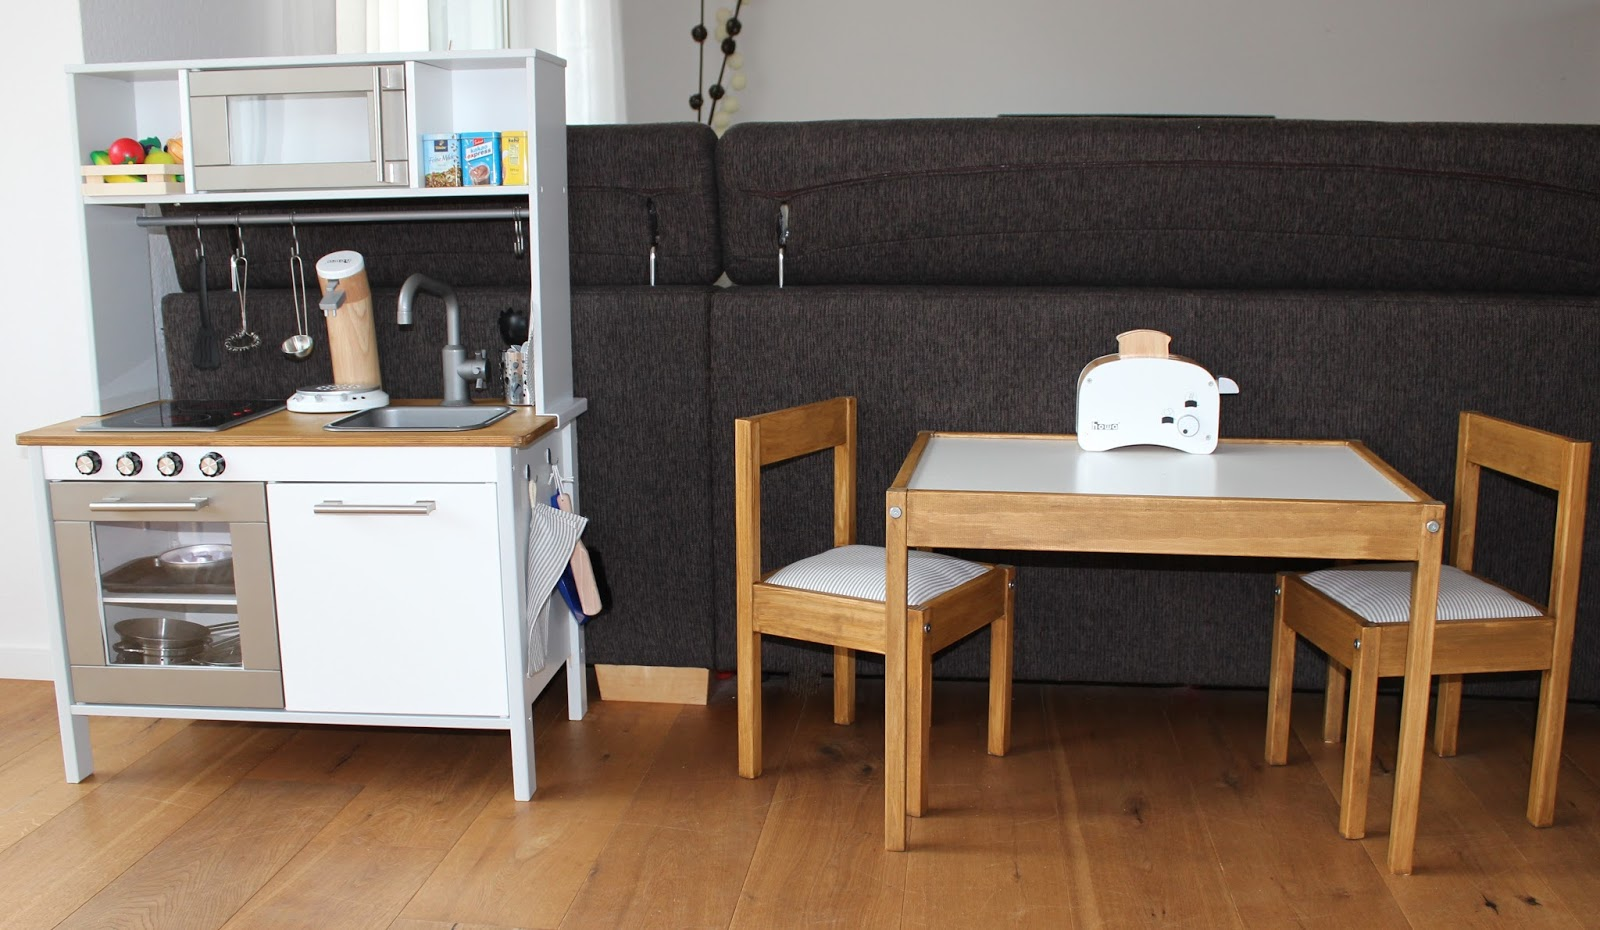 kreakind die ikea duktig spielk che in neuem gewand. Black Bedroom Furniture Sets. Home Design Ideas